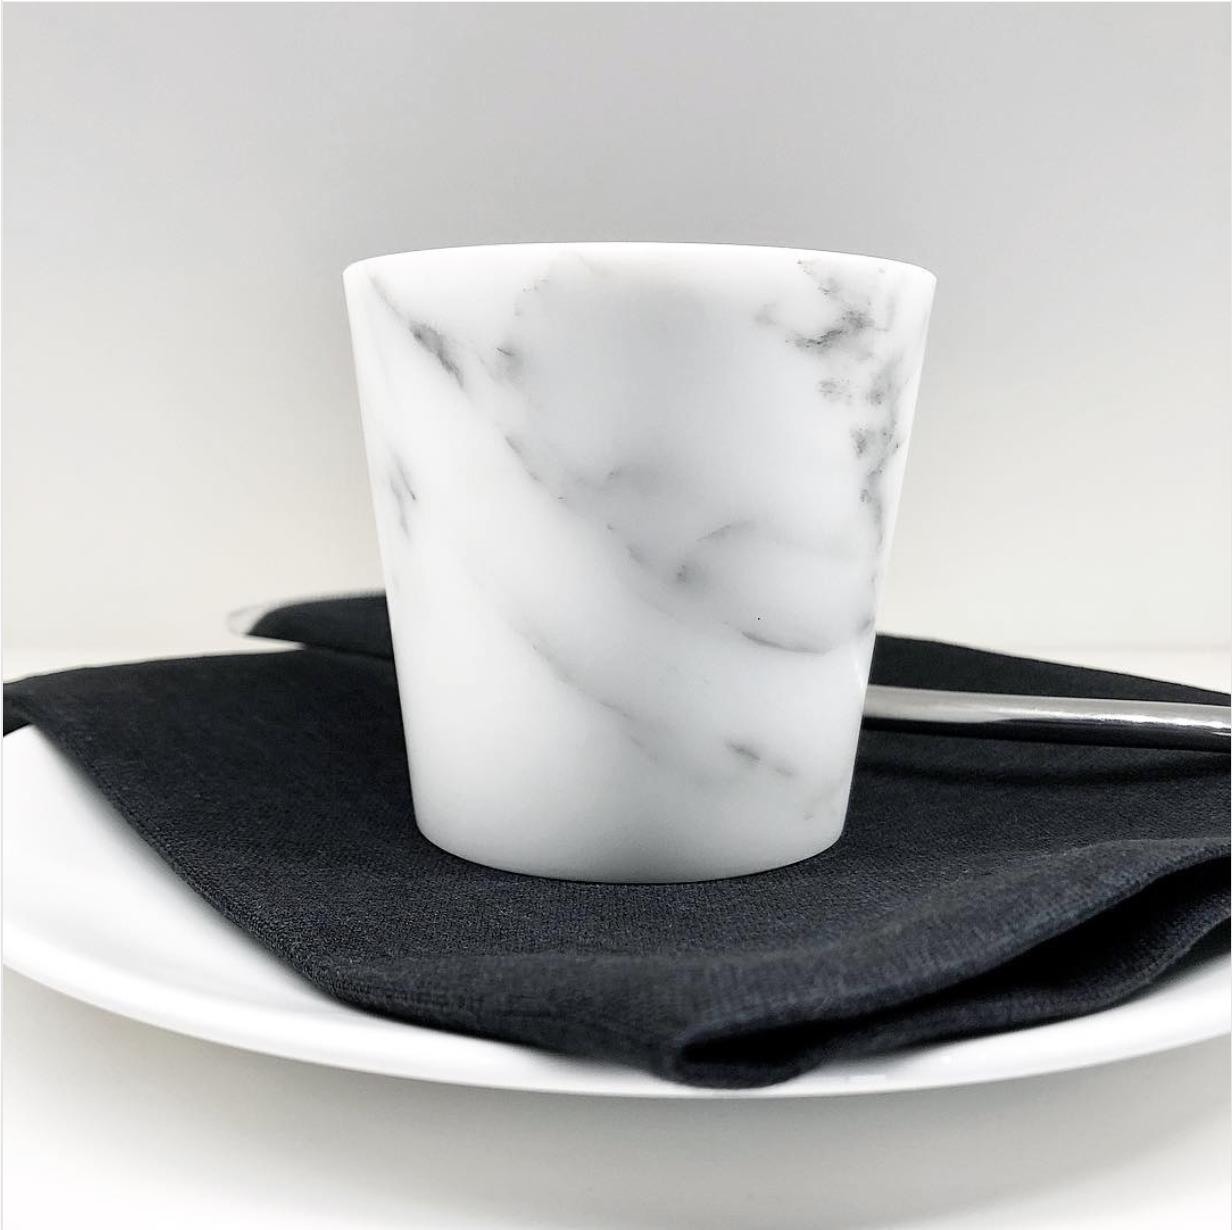 carrara marble water glass set.png